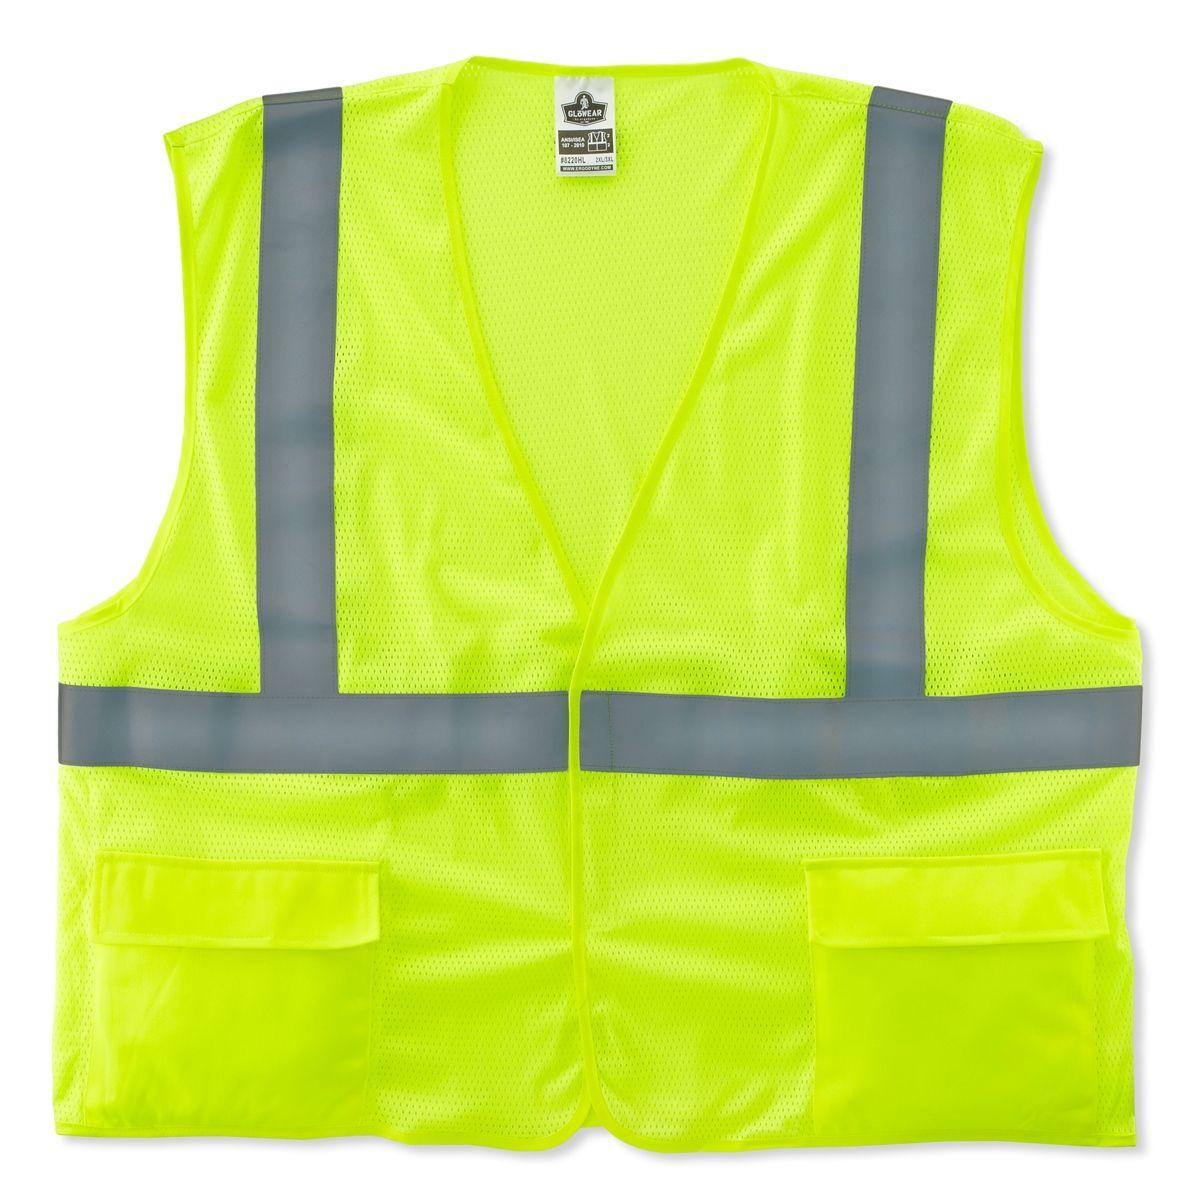 Ergodyne GloWear 8220HL Standard Vest Velcro Closure